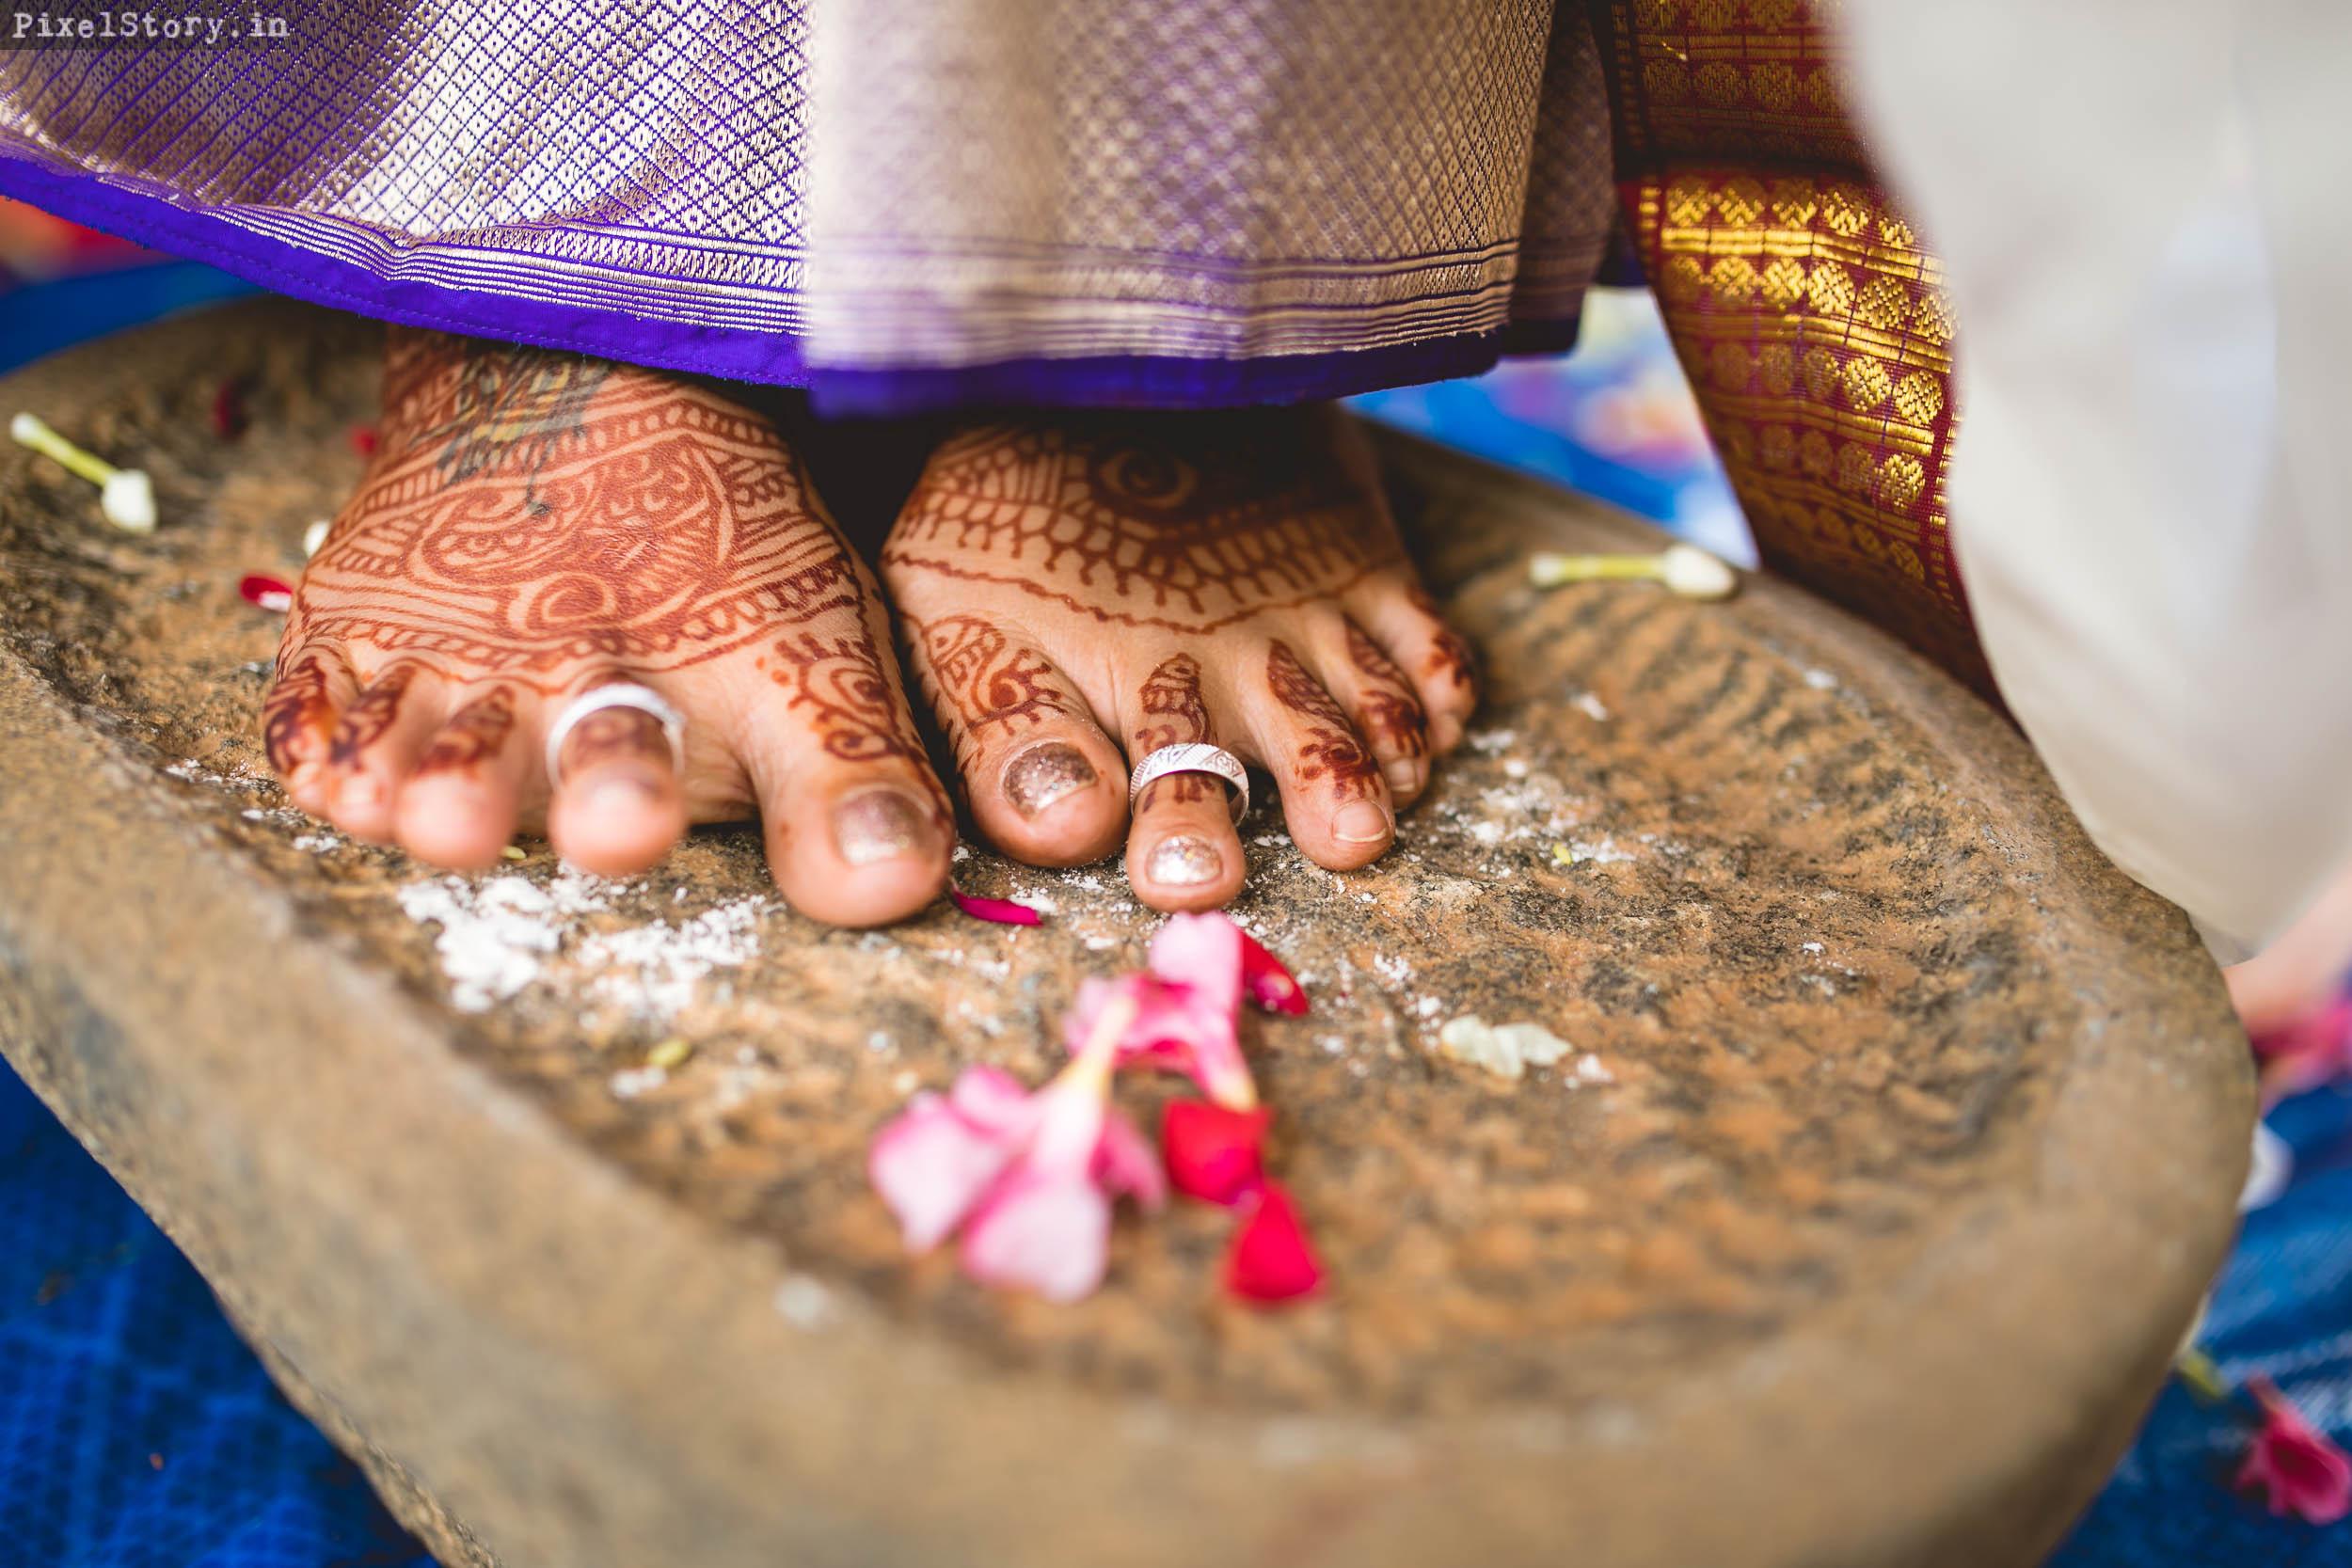 PixelStory-Jungle-Wedding-Photographer-Masinagudi-Indo-French072.jpg